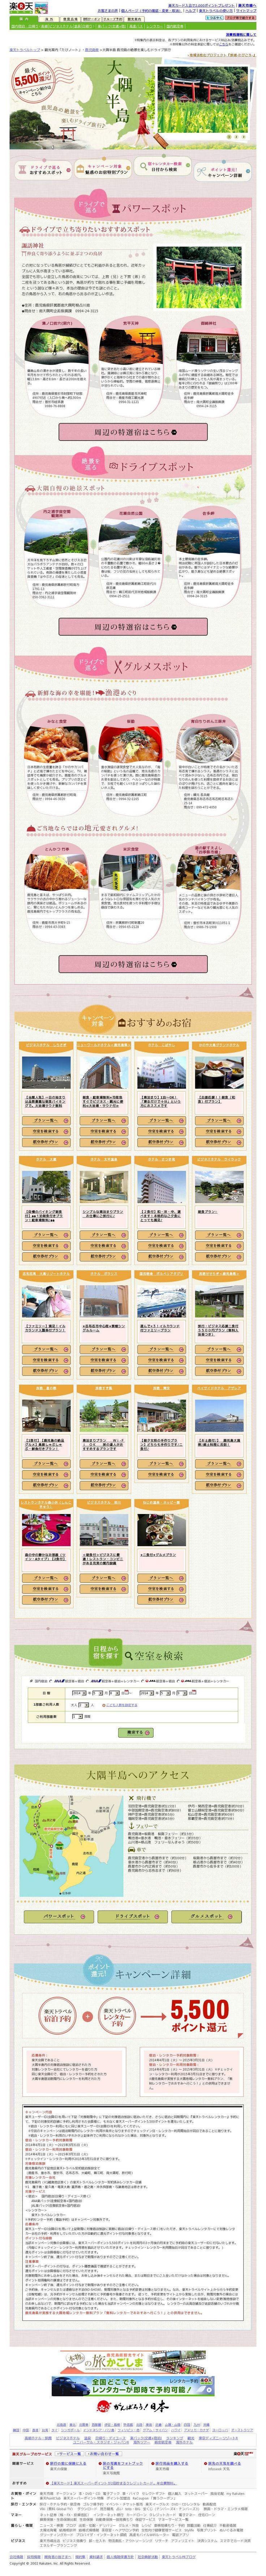 2014/4/1【D】【地域振興】 鹿児島県大隅半島レンタカーポイントキャンペーン2014